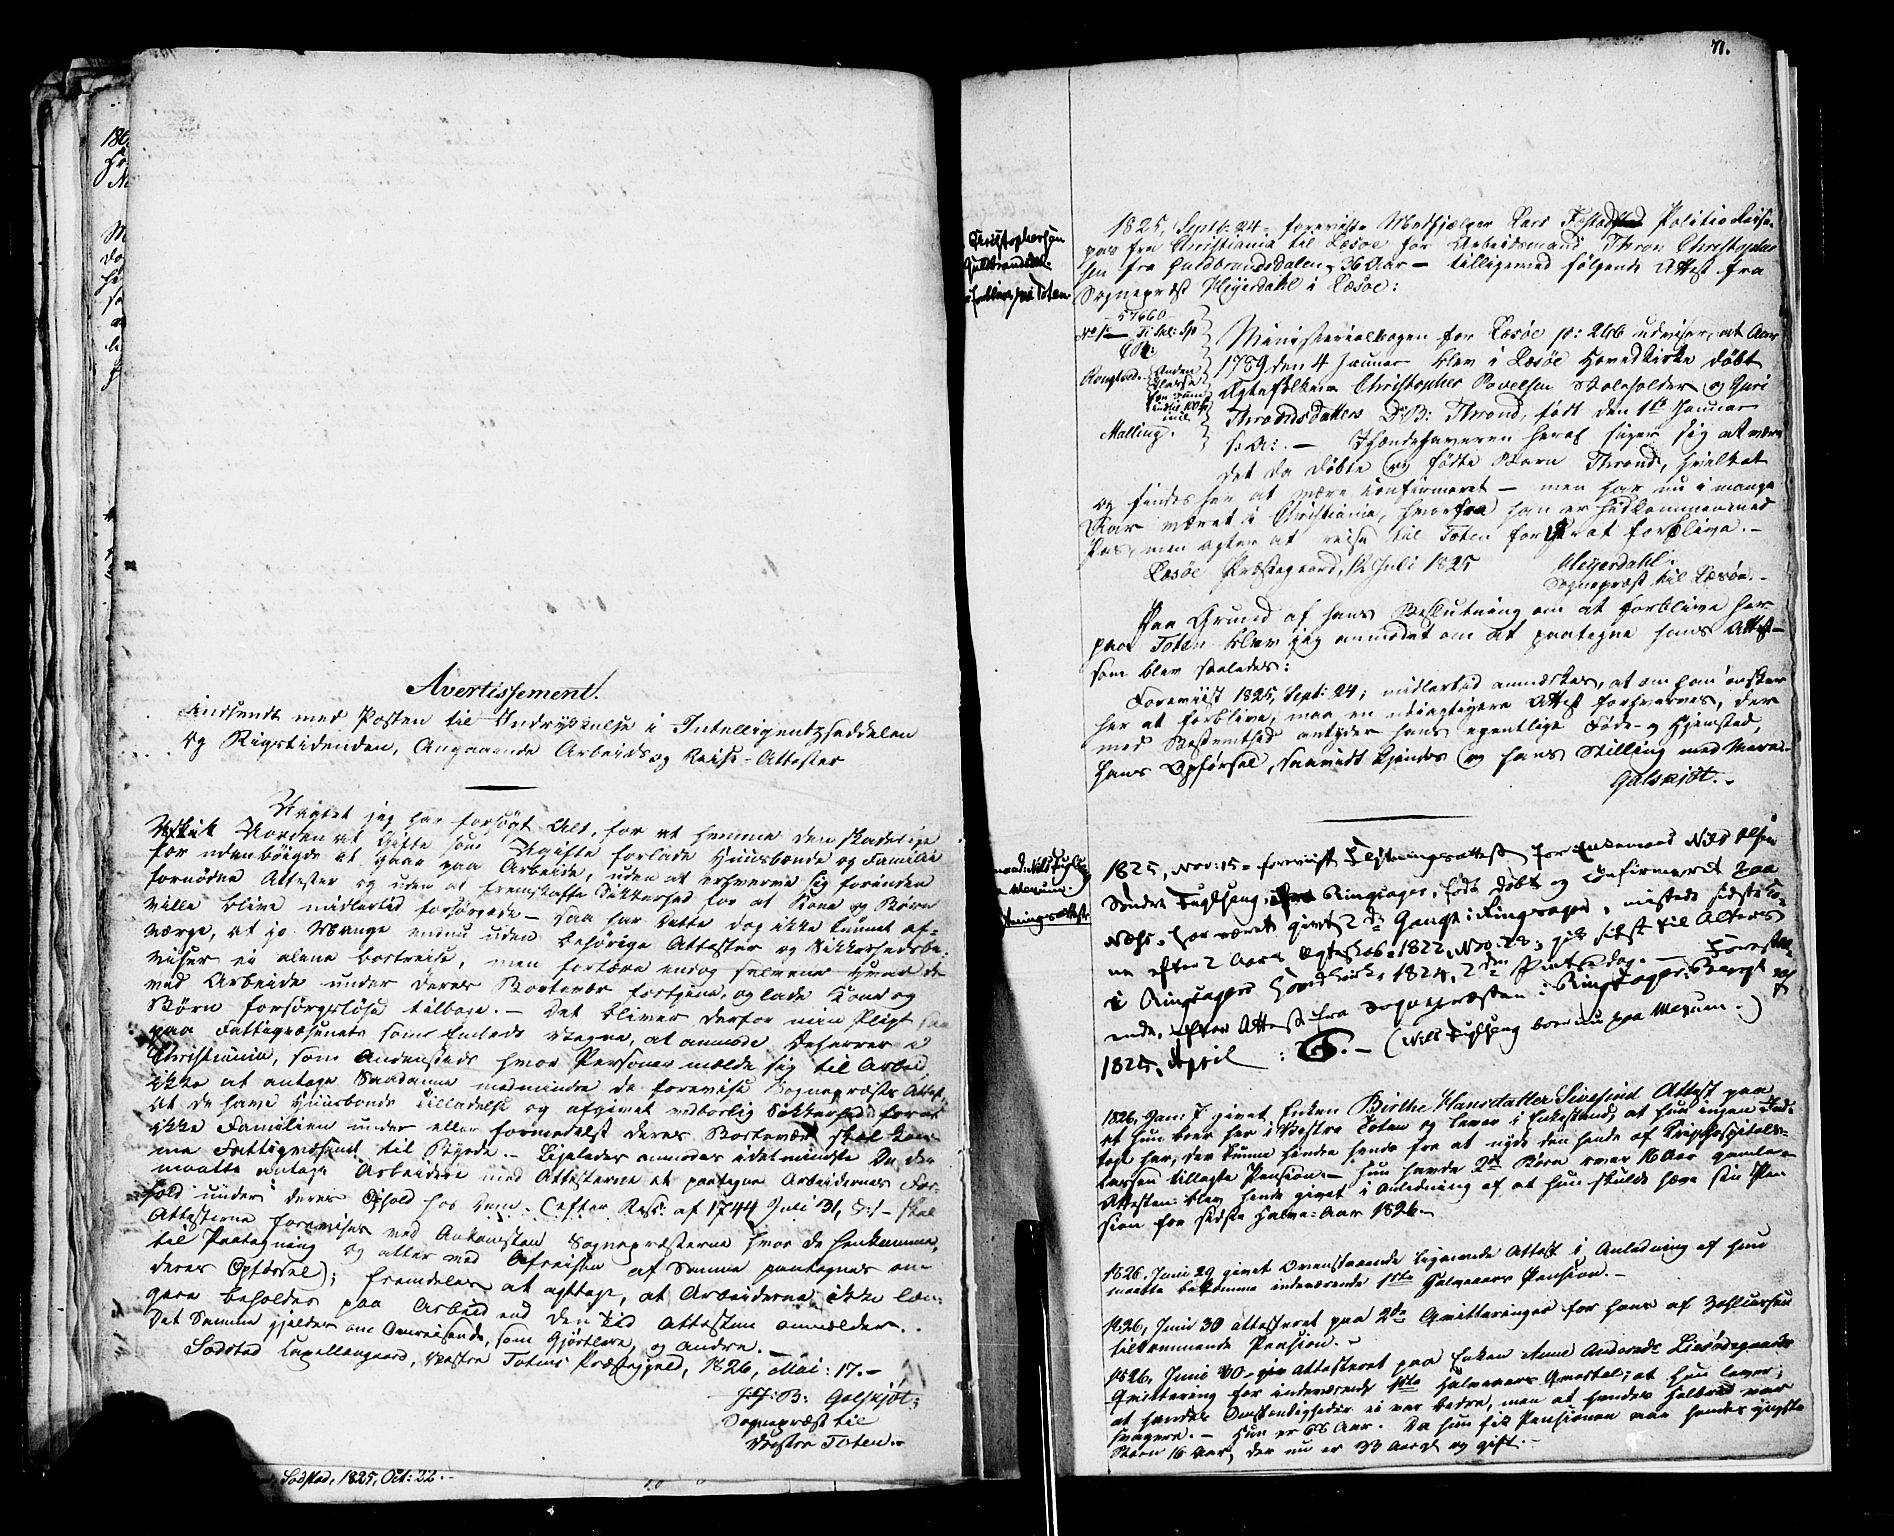 SAH, Vestre Toten prestekontor, H/Ha/Haa/L0001: Ministerialbok nr. 1, 1825-1826, s. 71